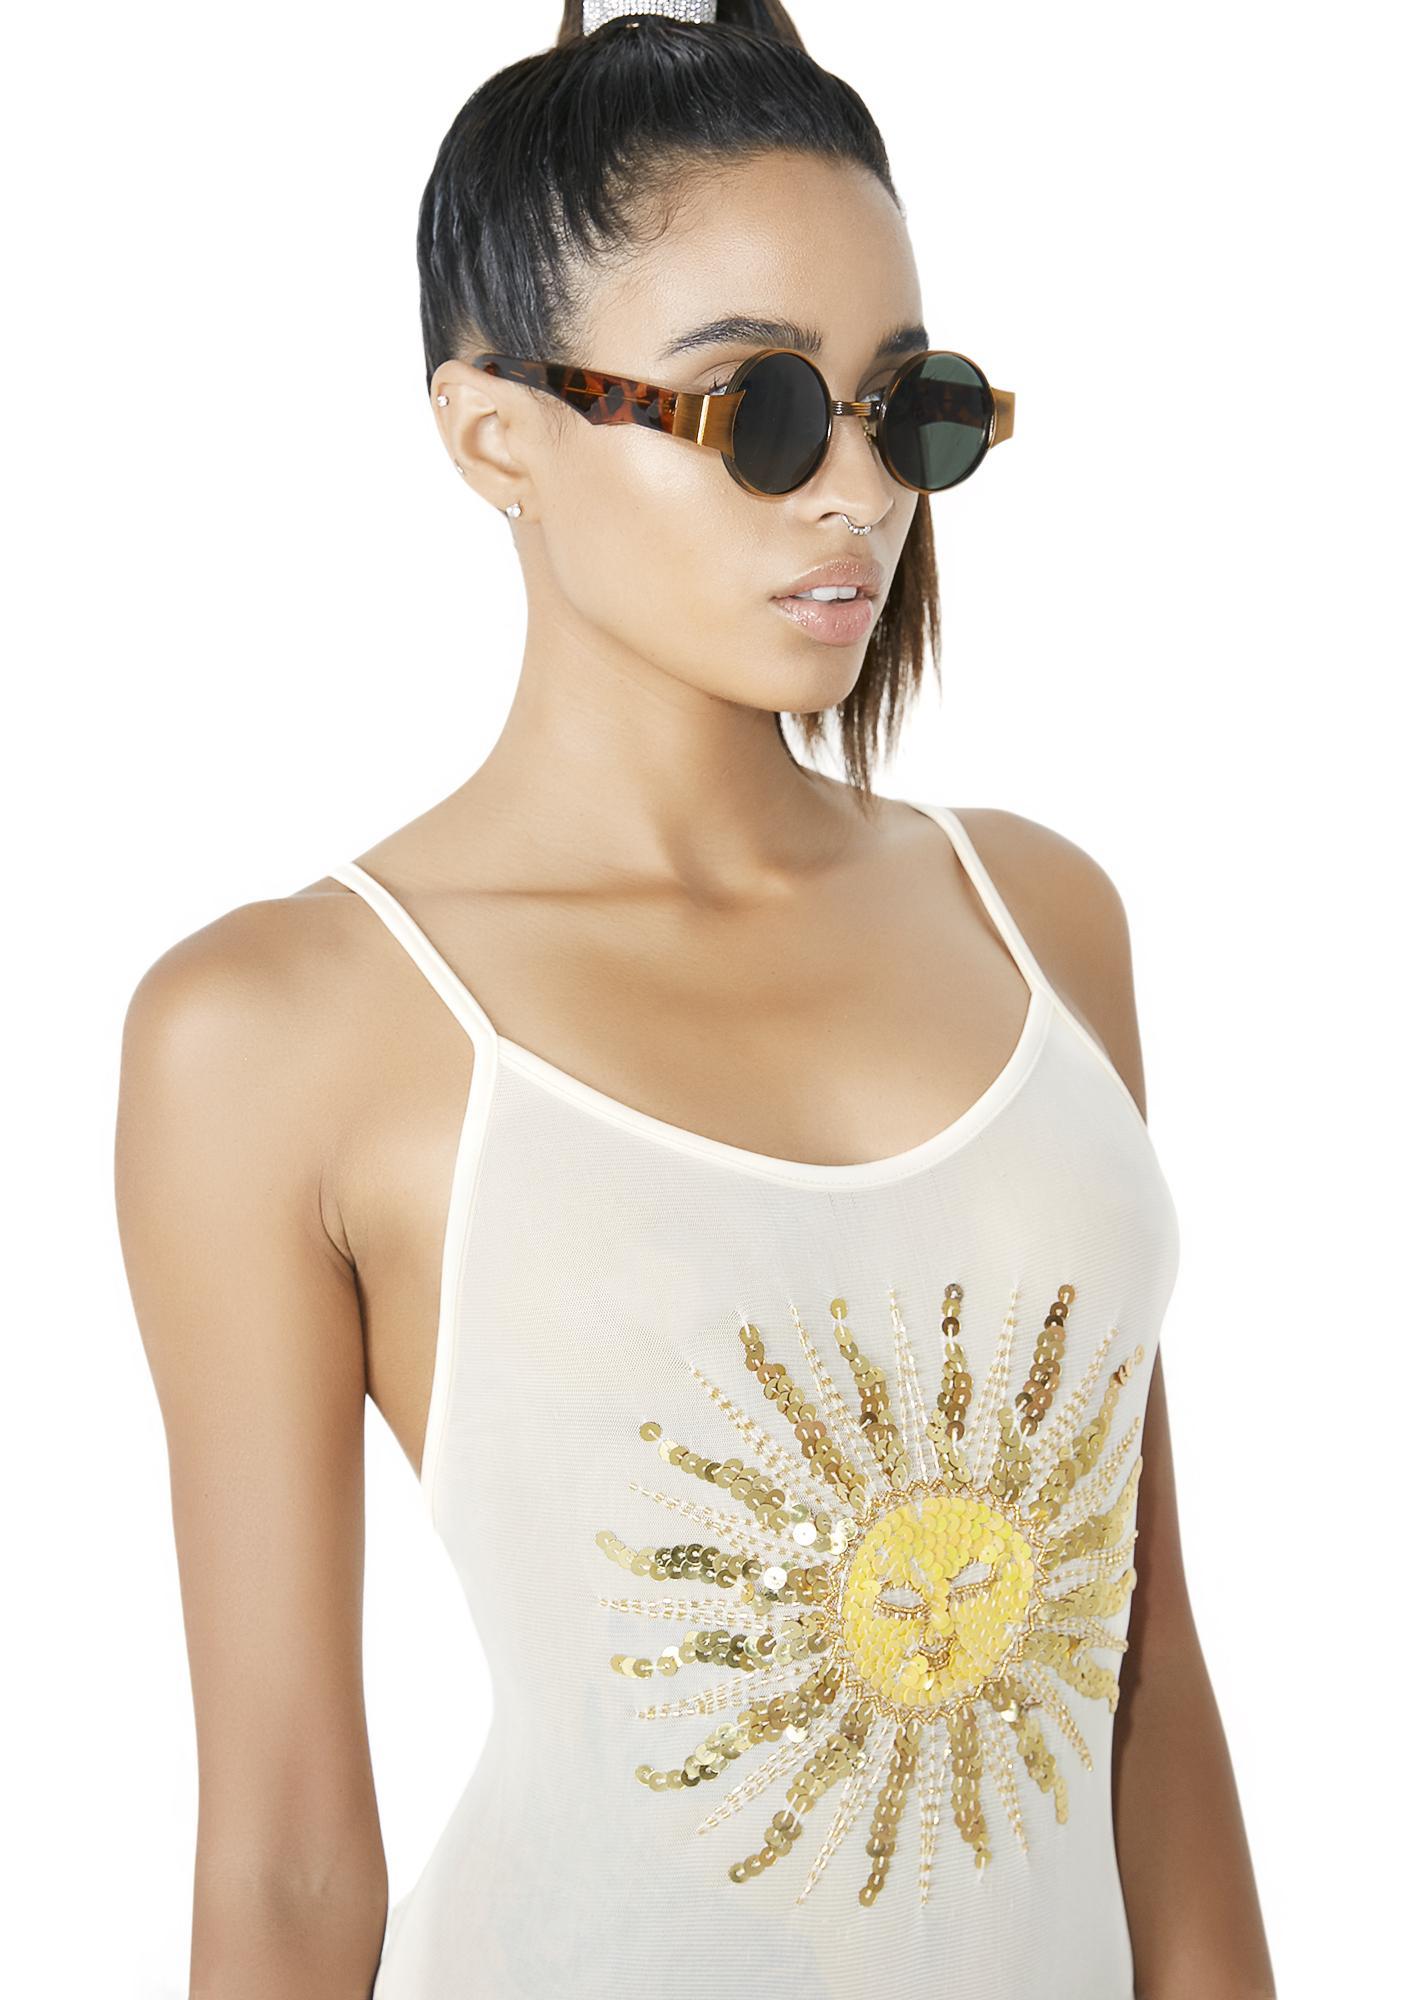 Her Pony Marlo Sheer Sequin Celestial Sun Bodysuit